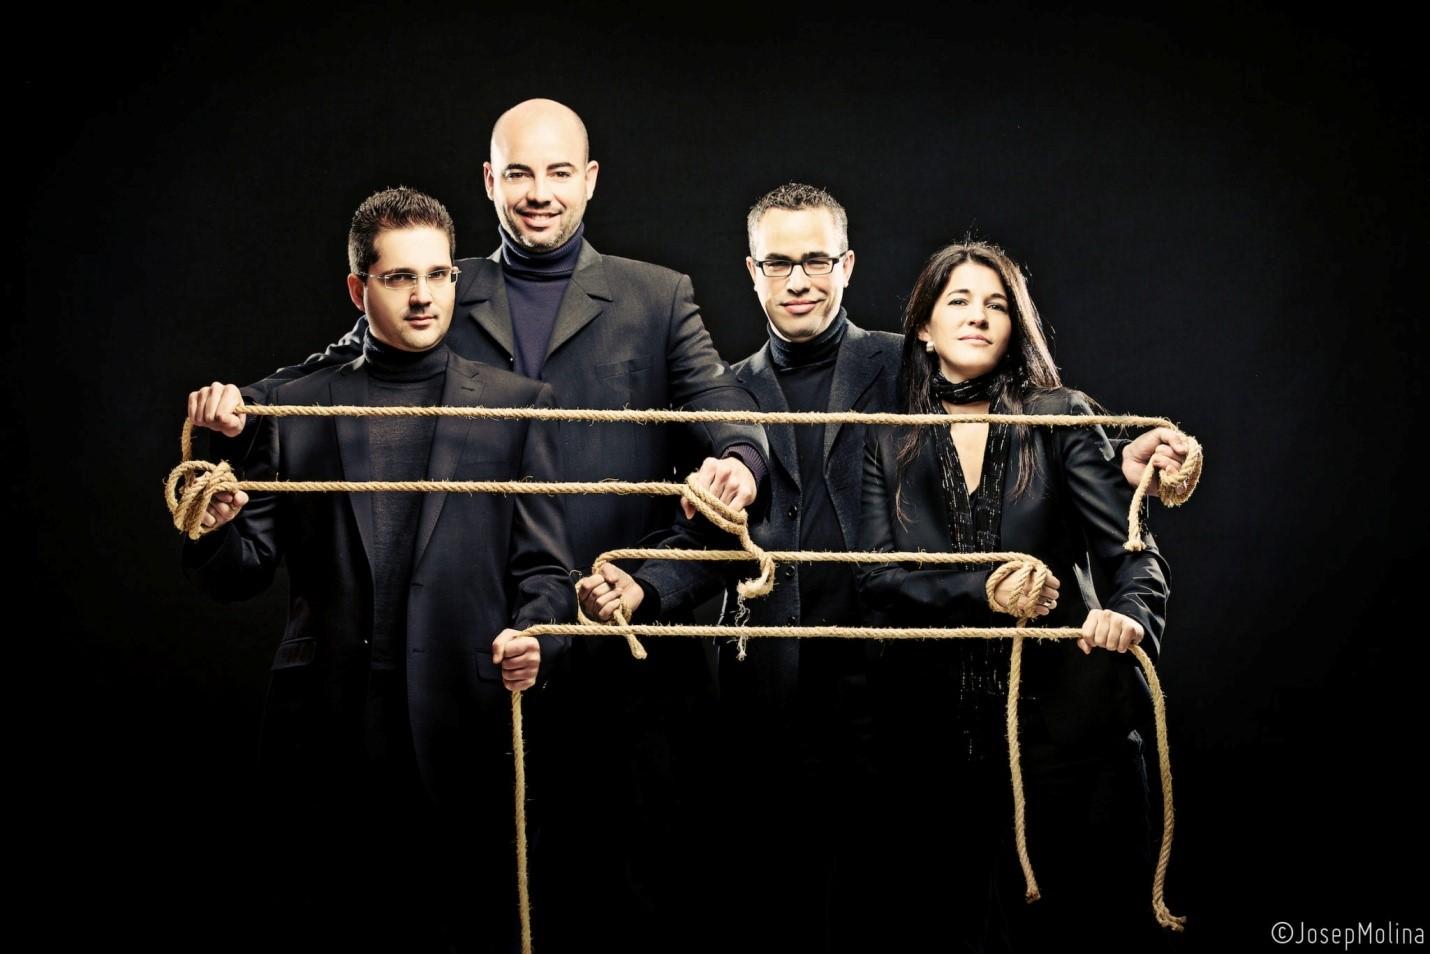 Cuarteto Quiroga, Premio 2021 del Internacional de Música de Isla Cristina